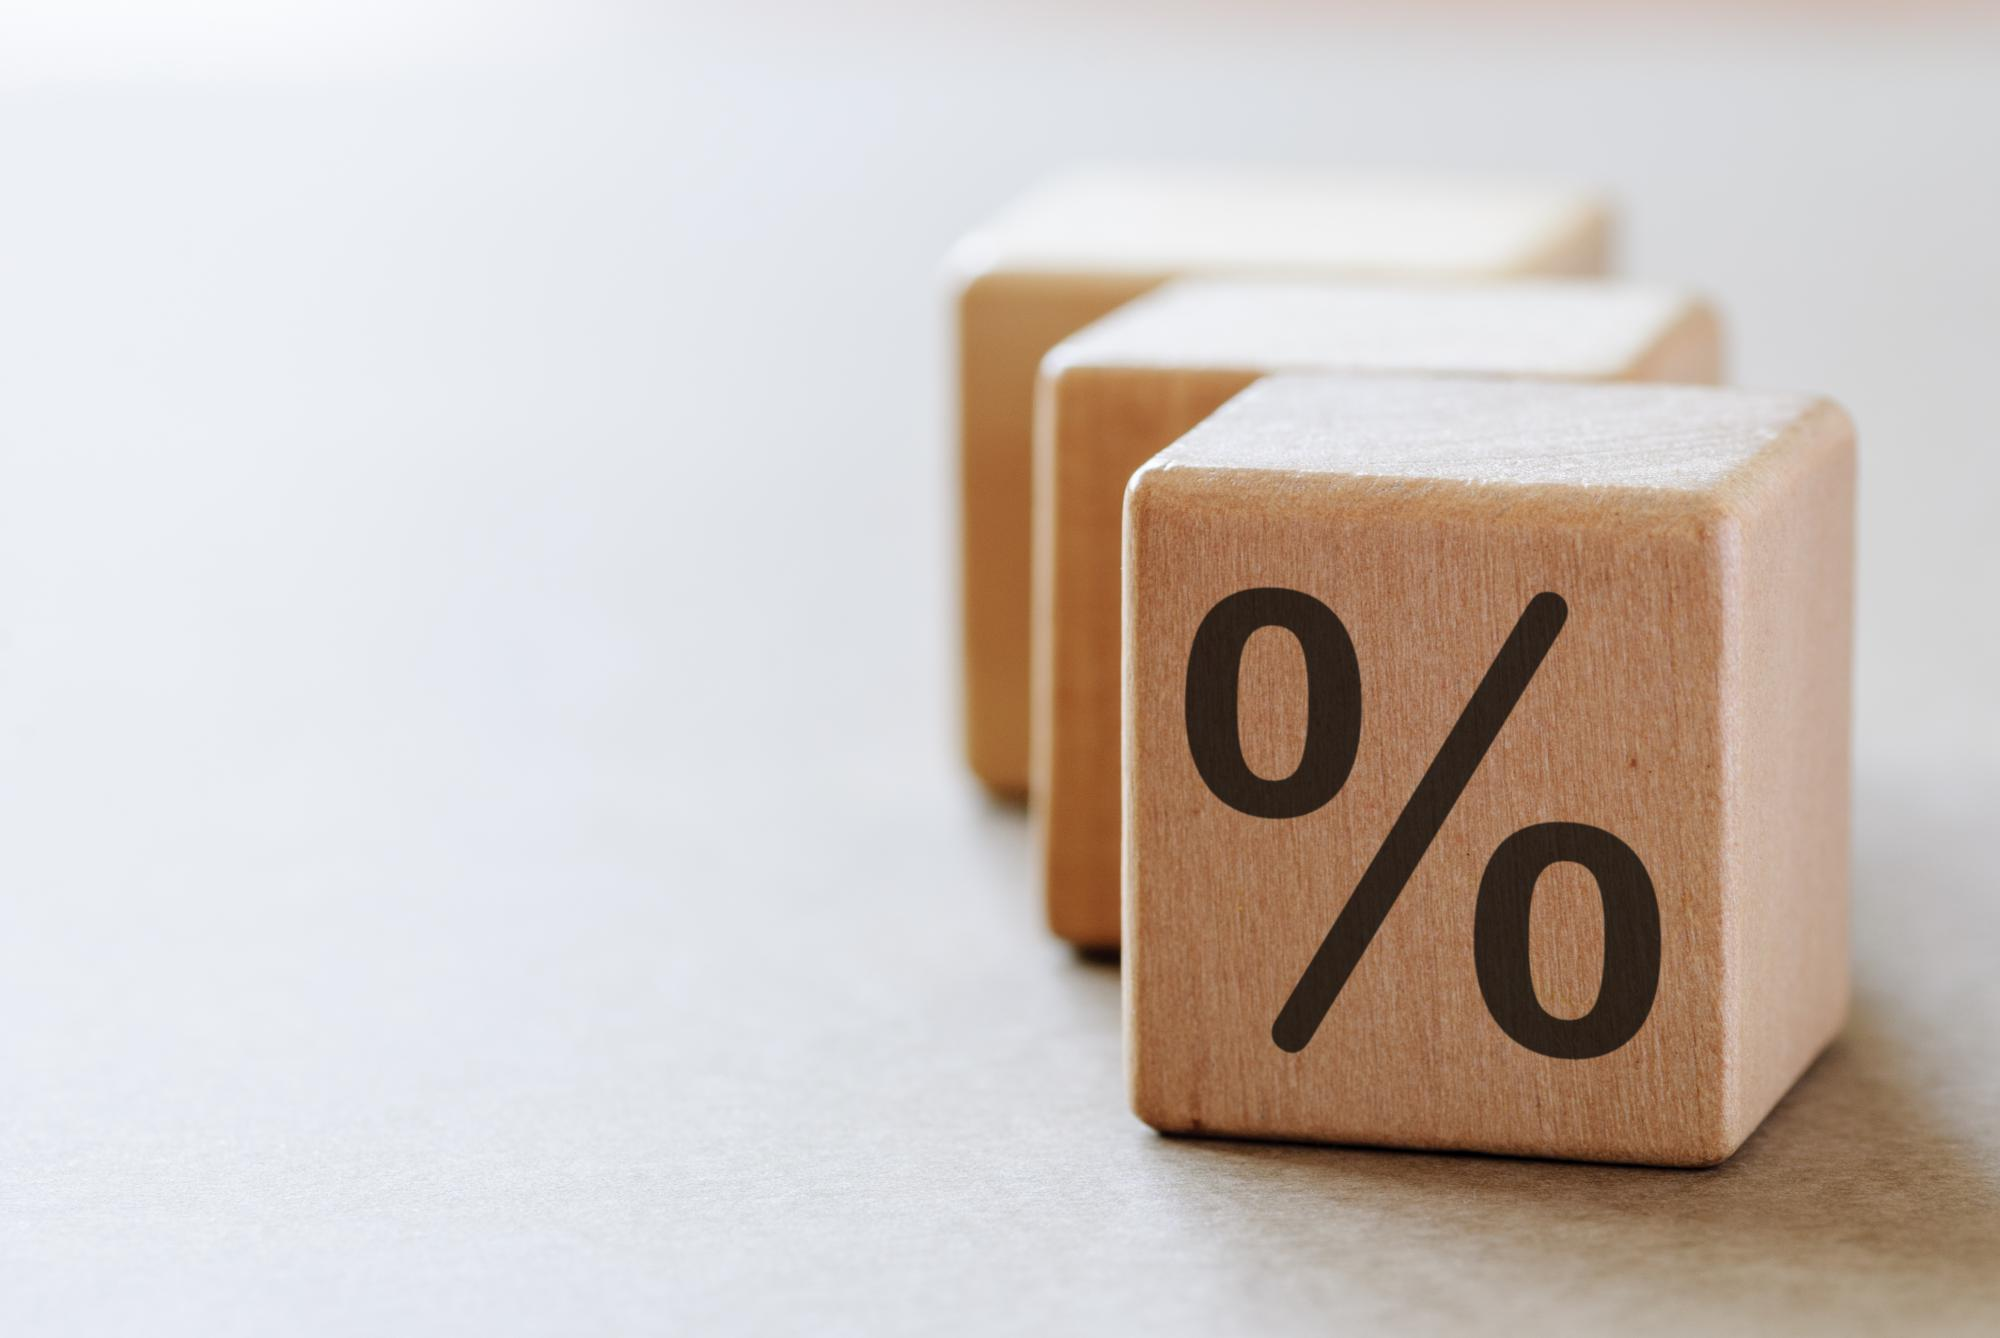 Налогообложение процентного дохода по депозитам, акциям, облигациям уравняют